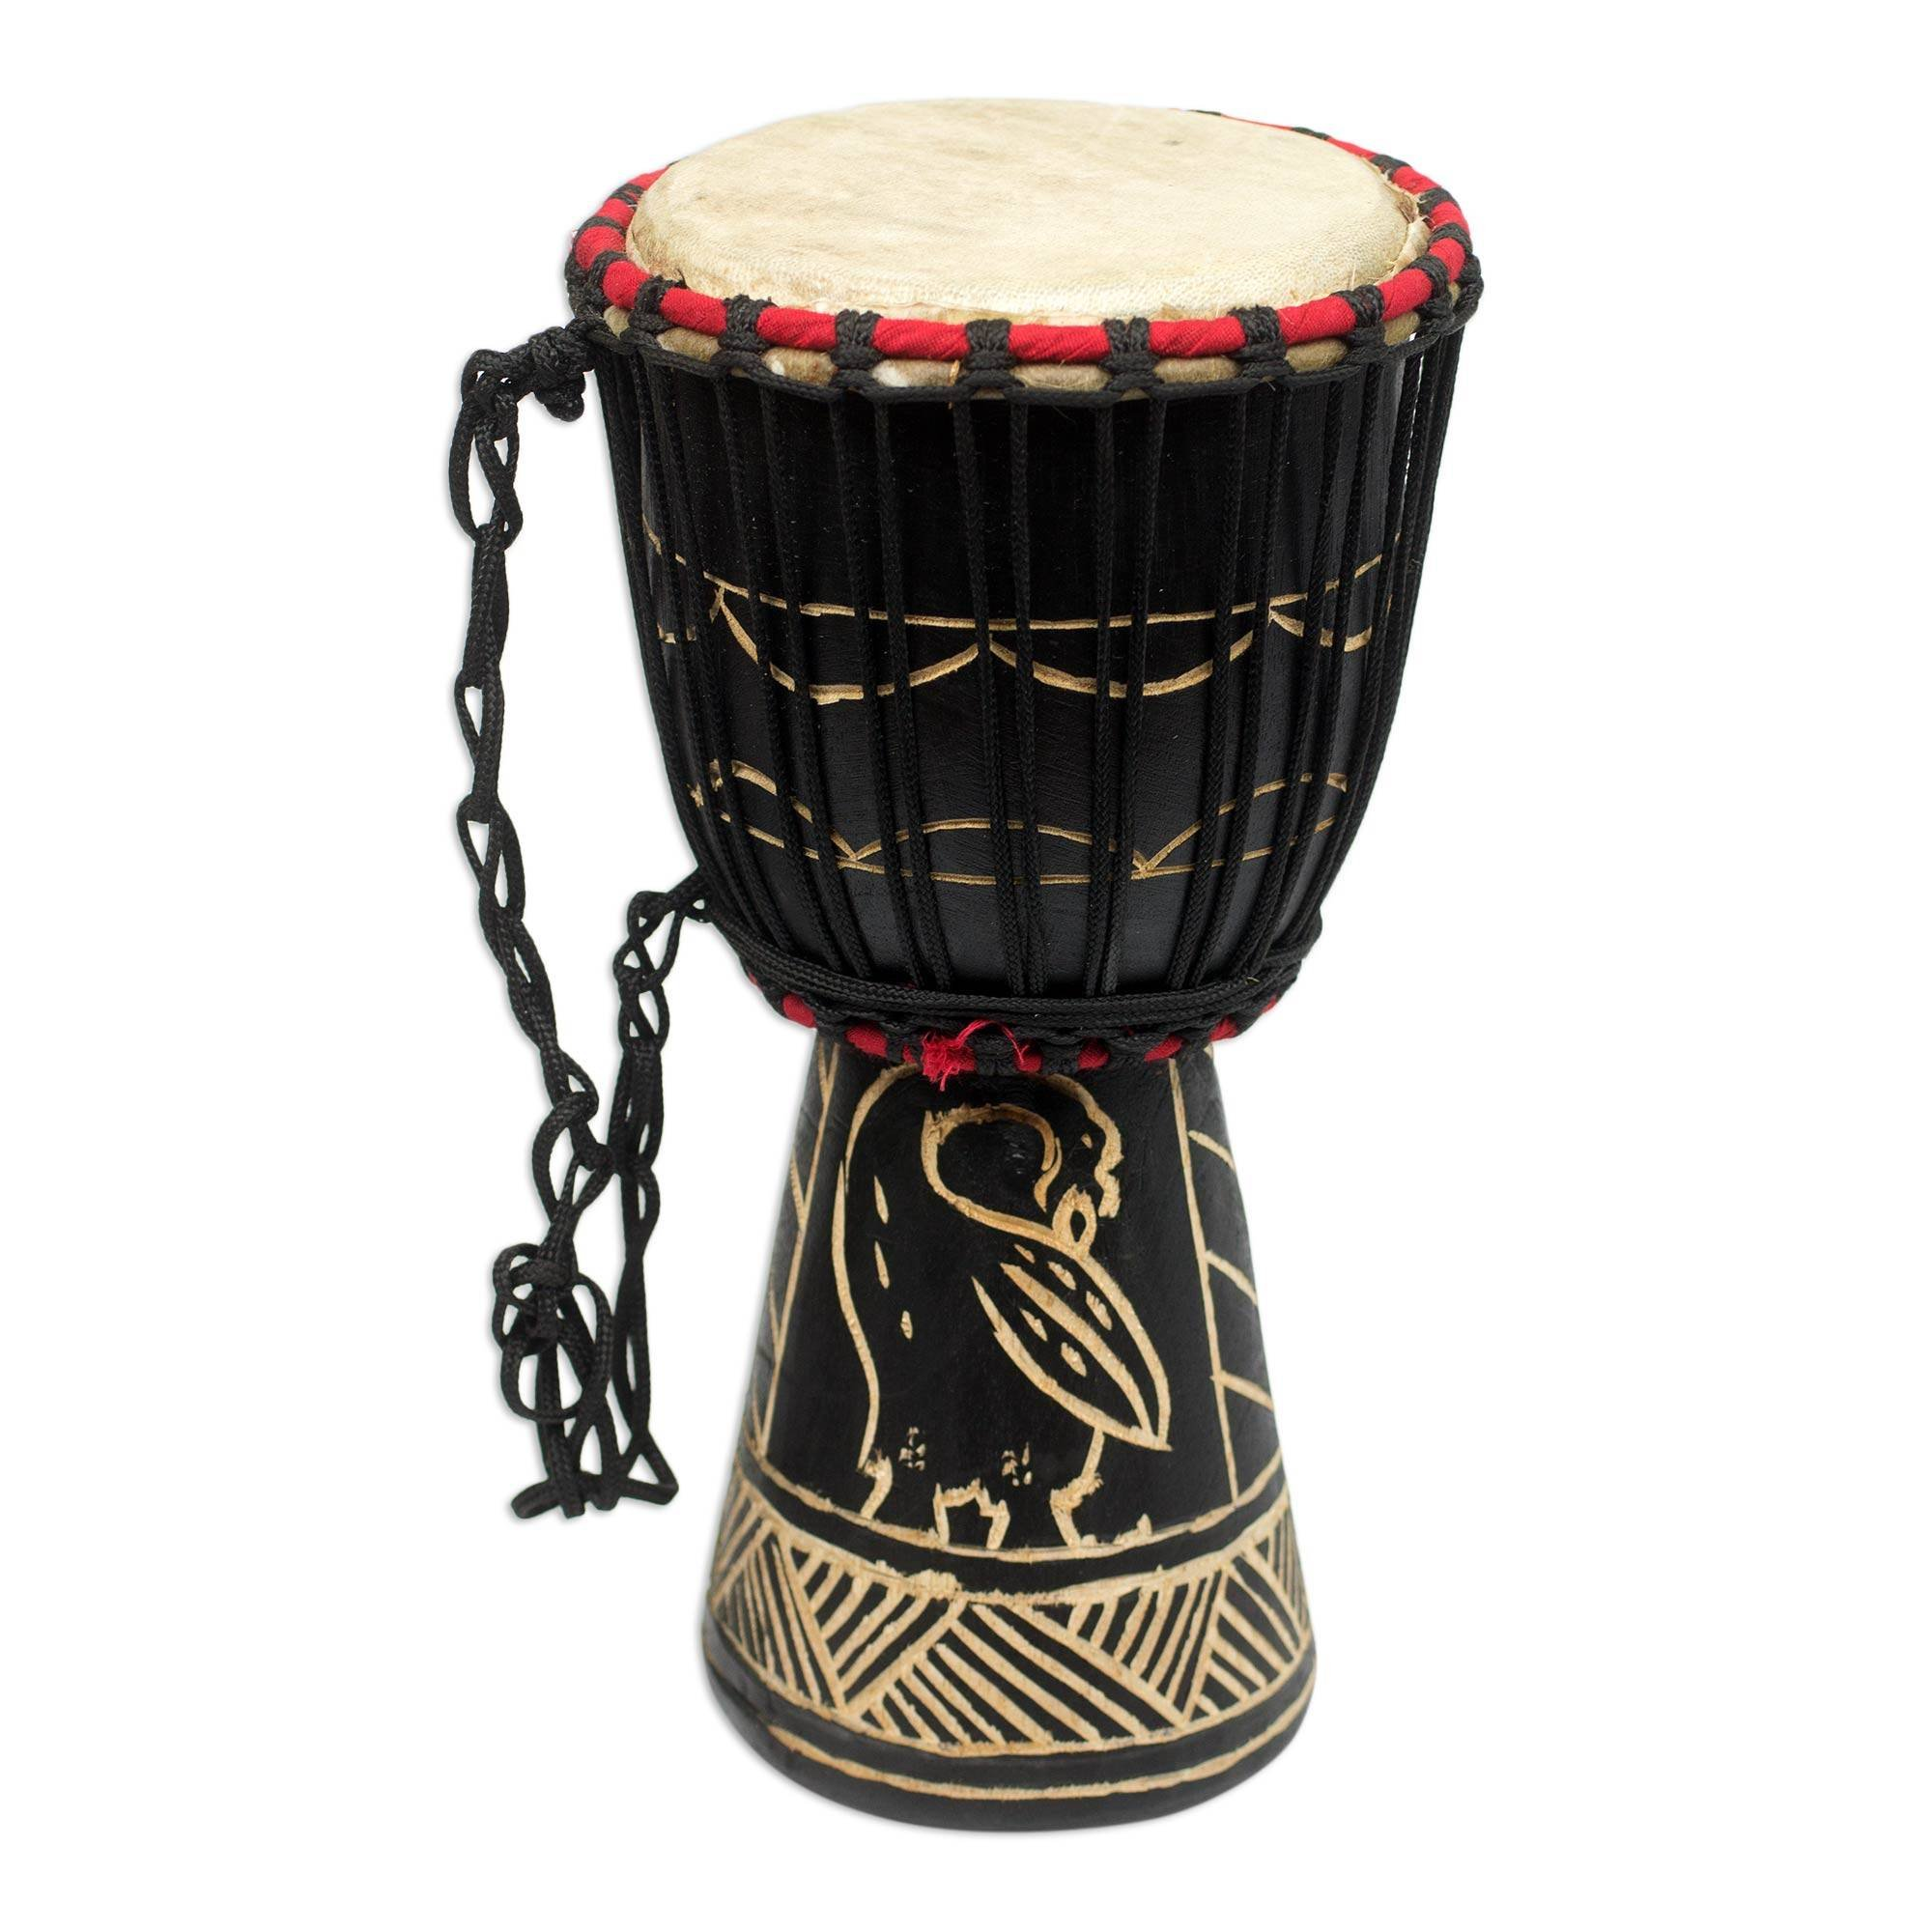 NOVICA Animal Themed Wood Drums, Brown, 'Revival'